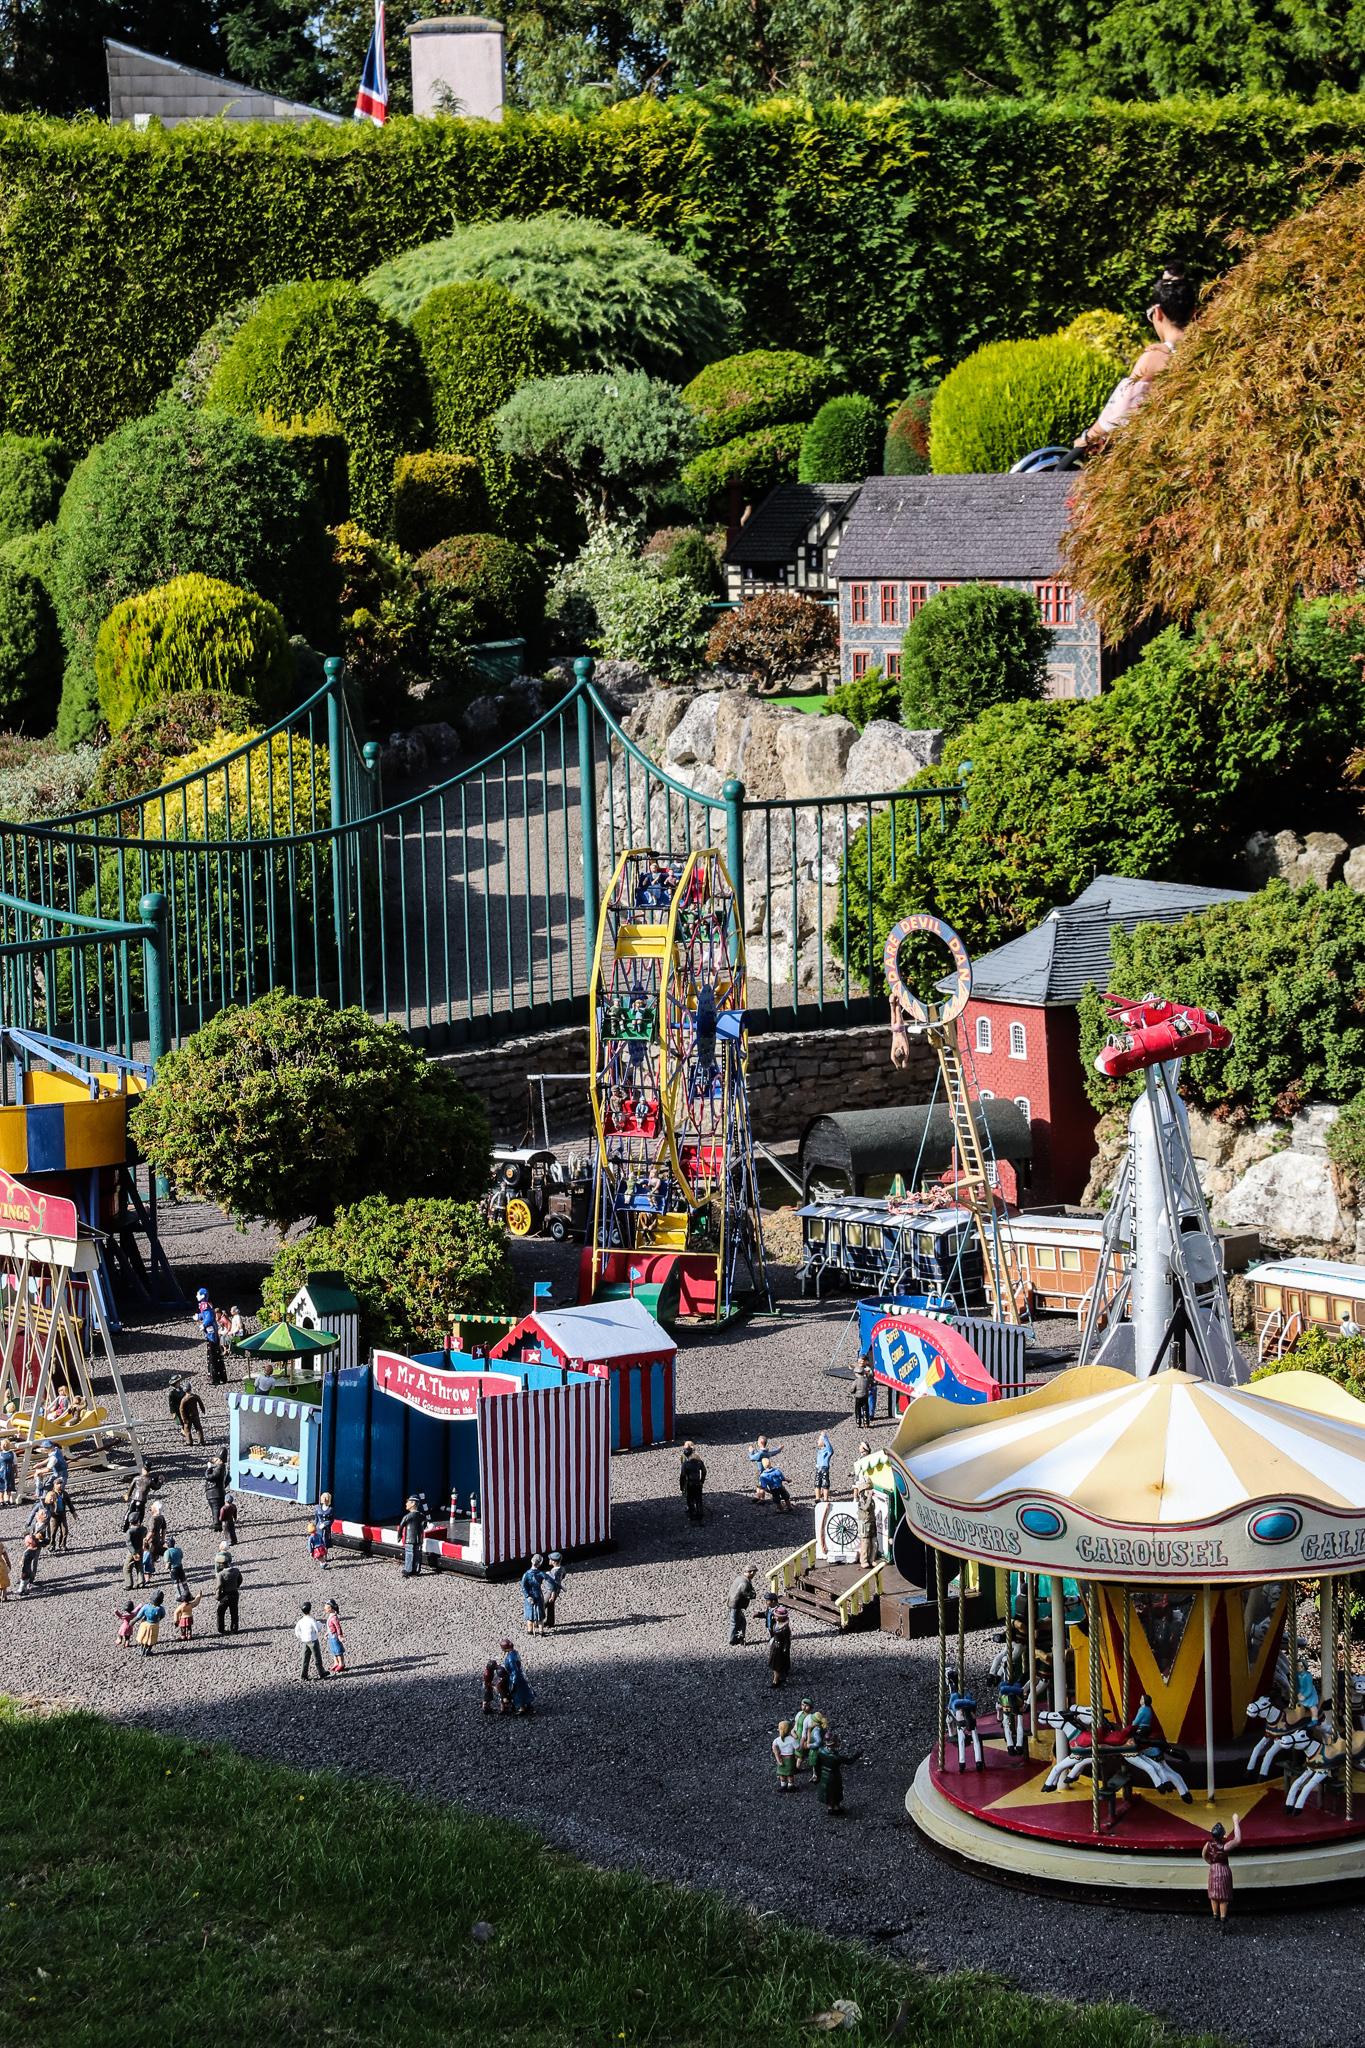 A view of a miniature funfair inside the  model village.